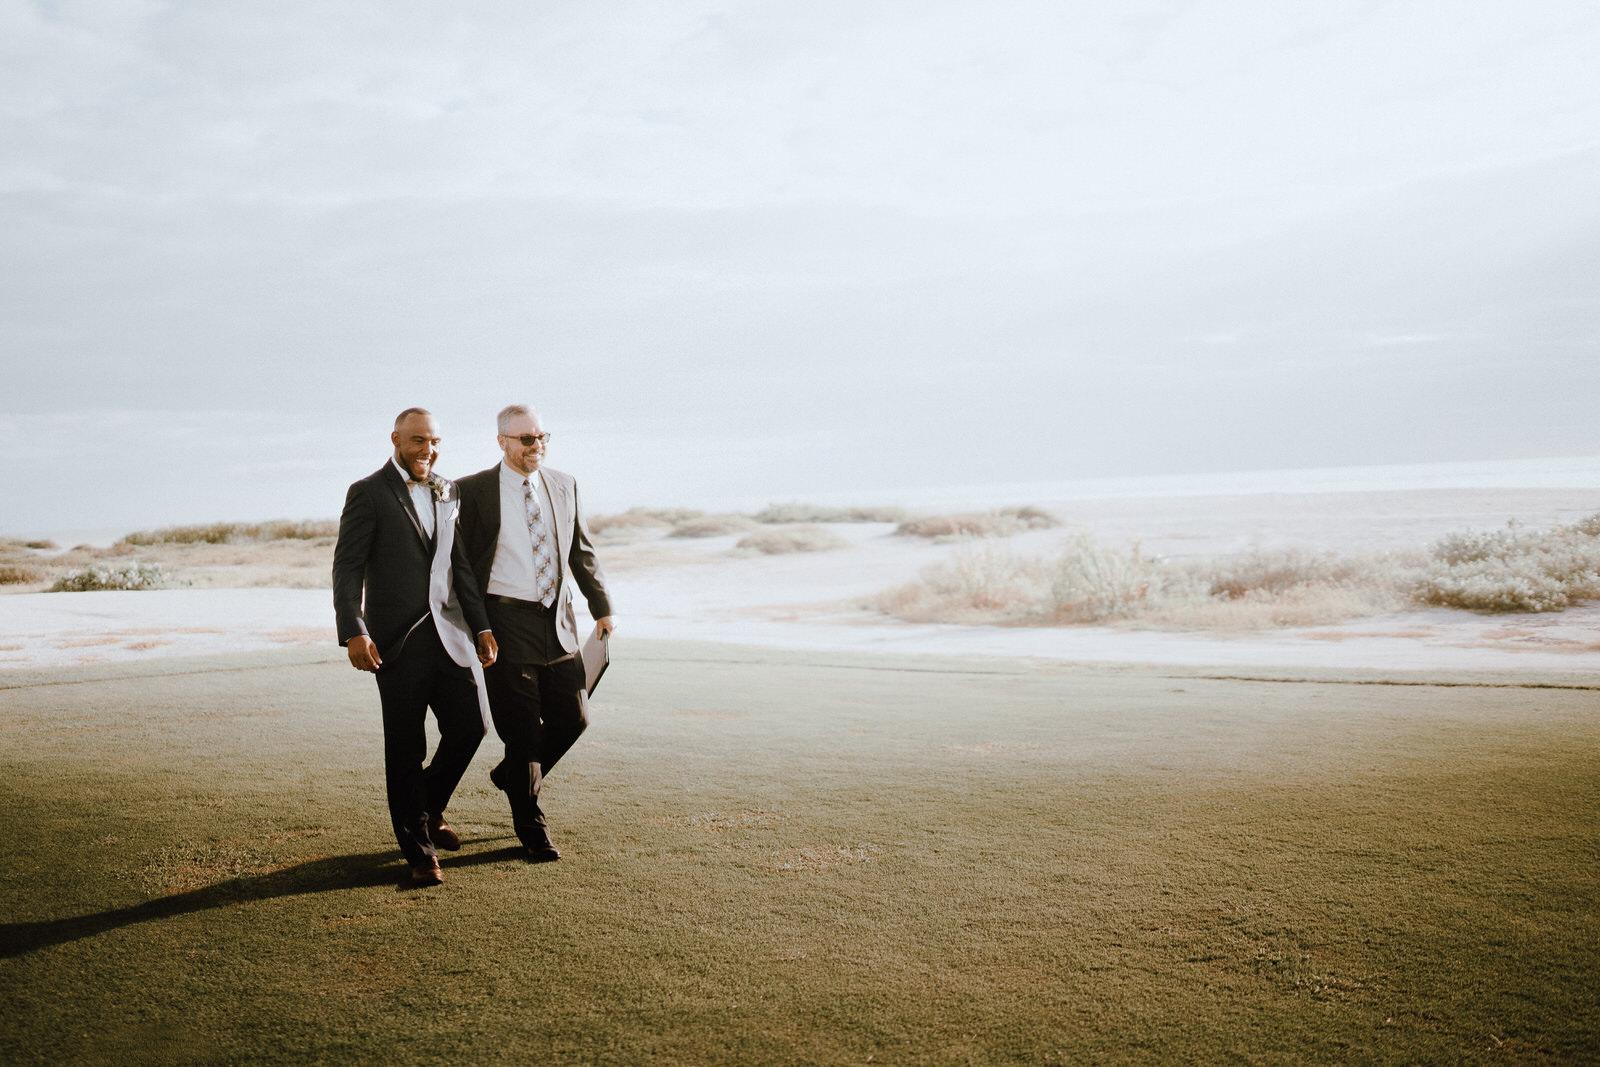 South Seas Island Resort Elopement- Alyana and Shawn- Michelle Gonzalez Photography-418.JPG